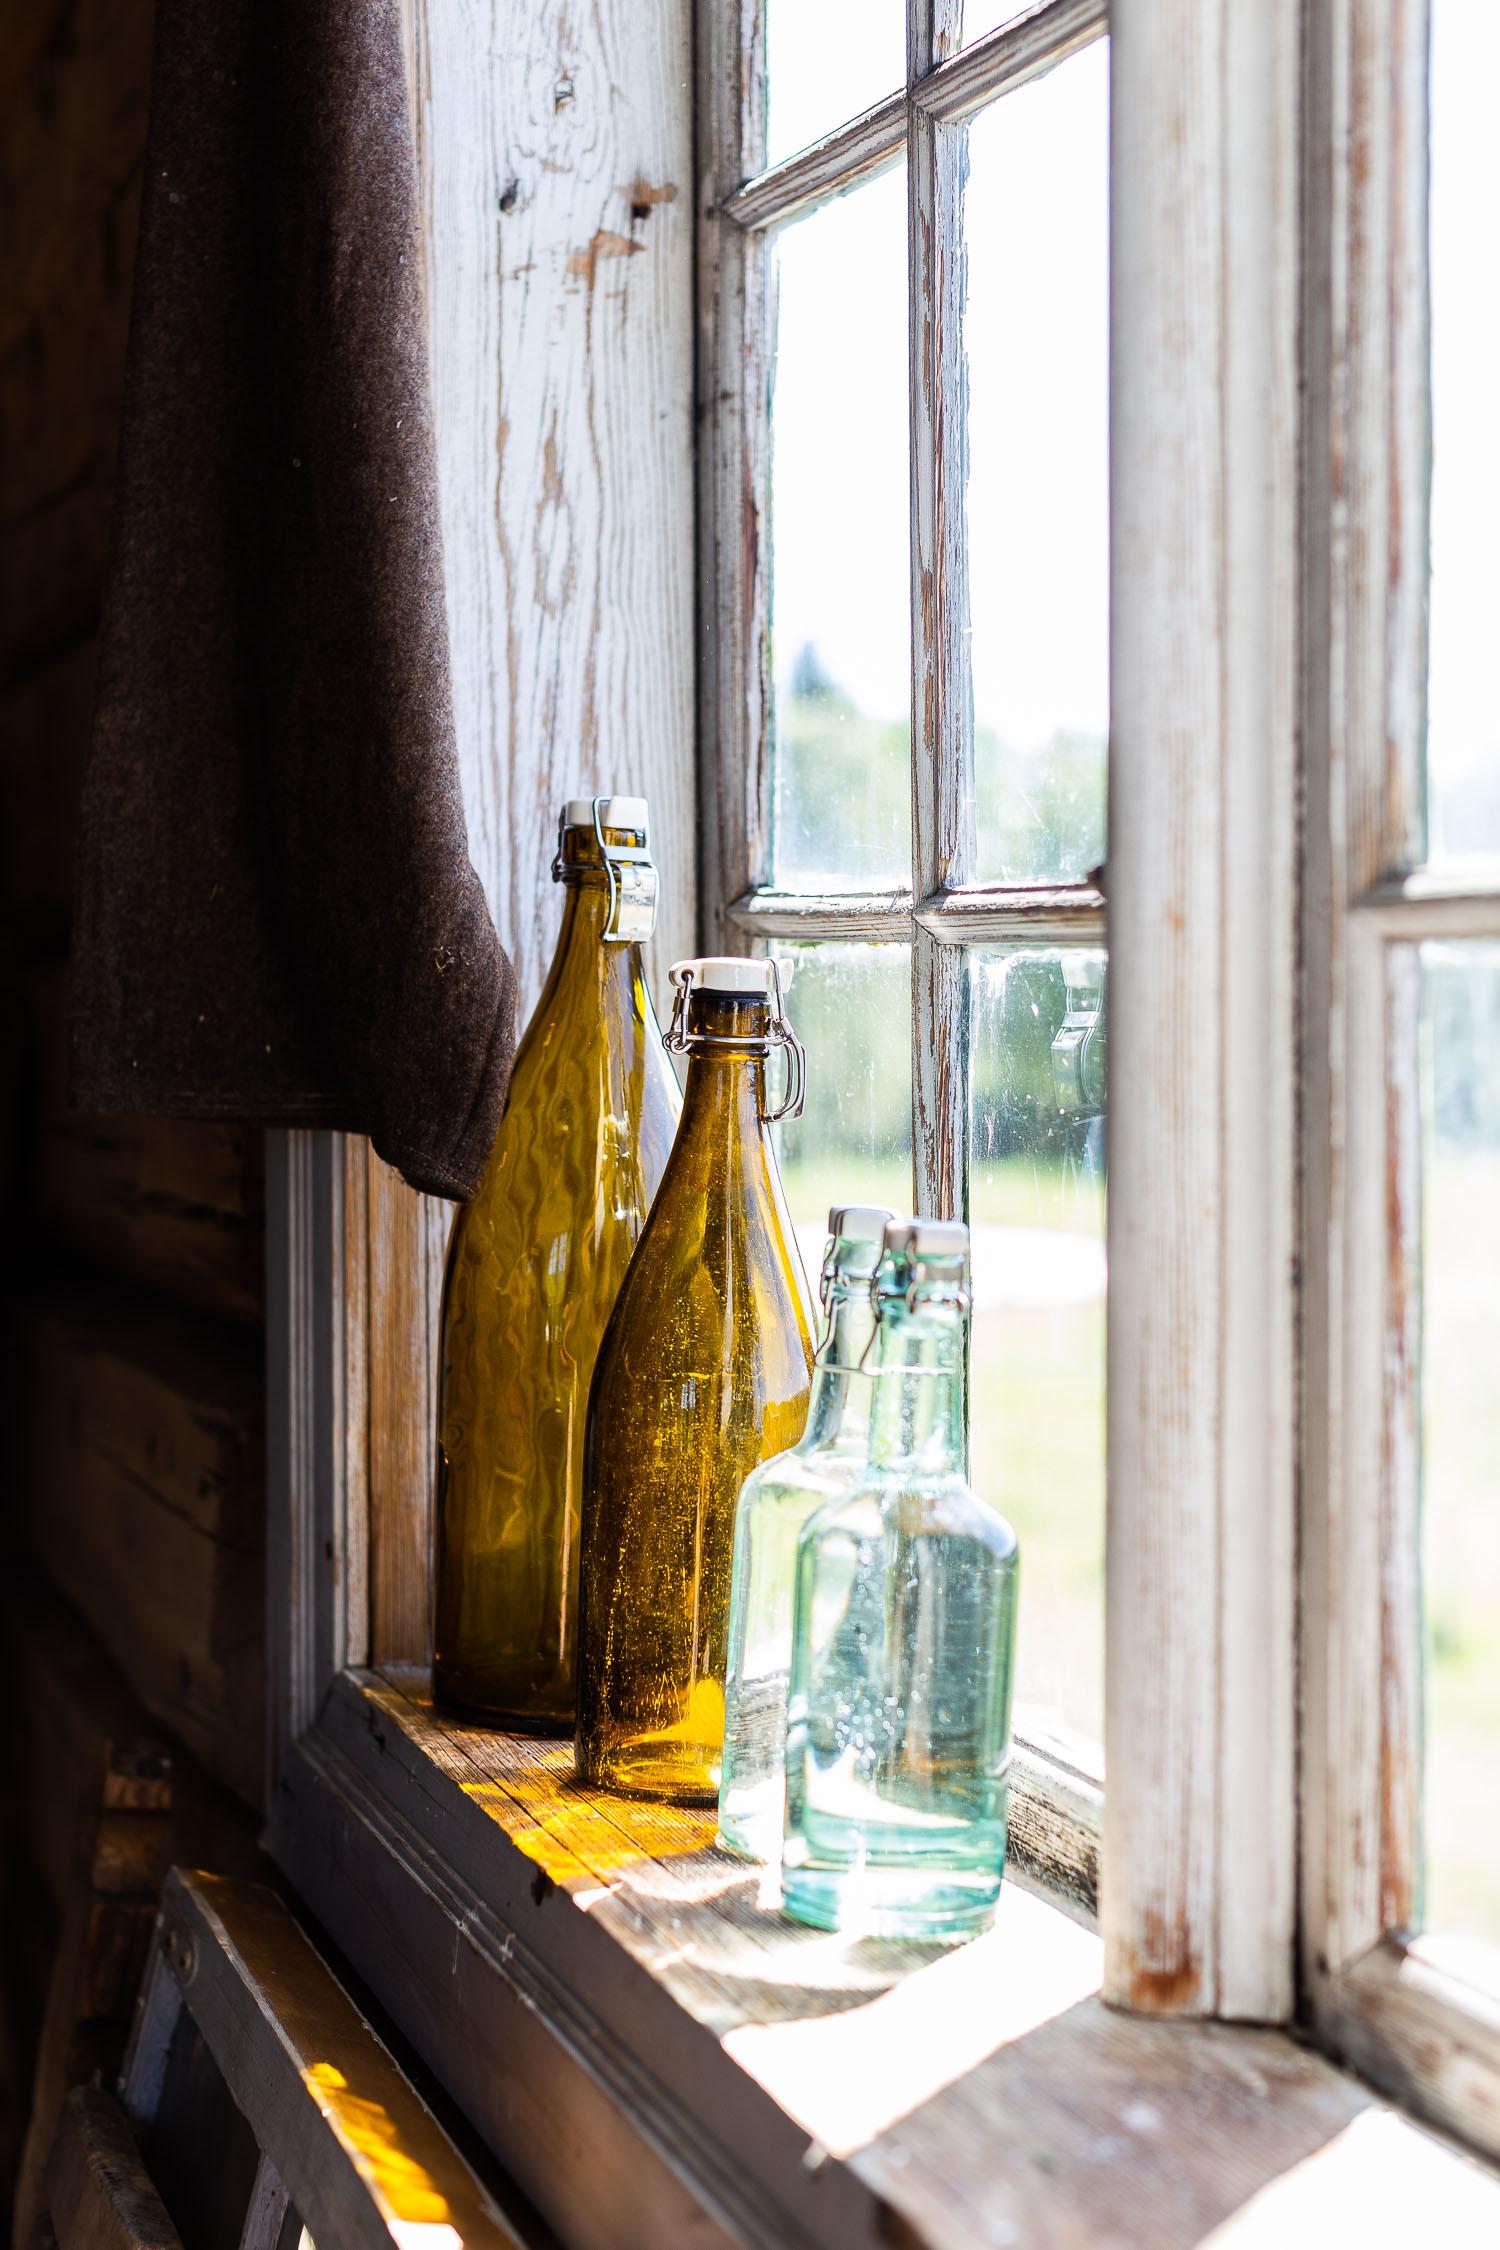 Norway-glass-bottles-on-the-window-2318.jpg